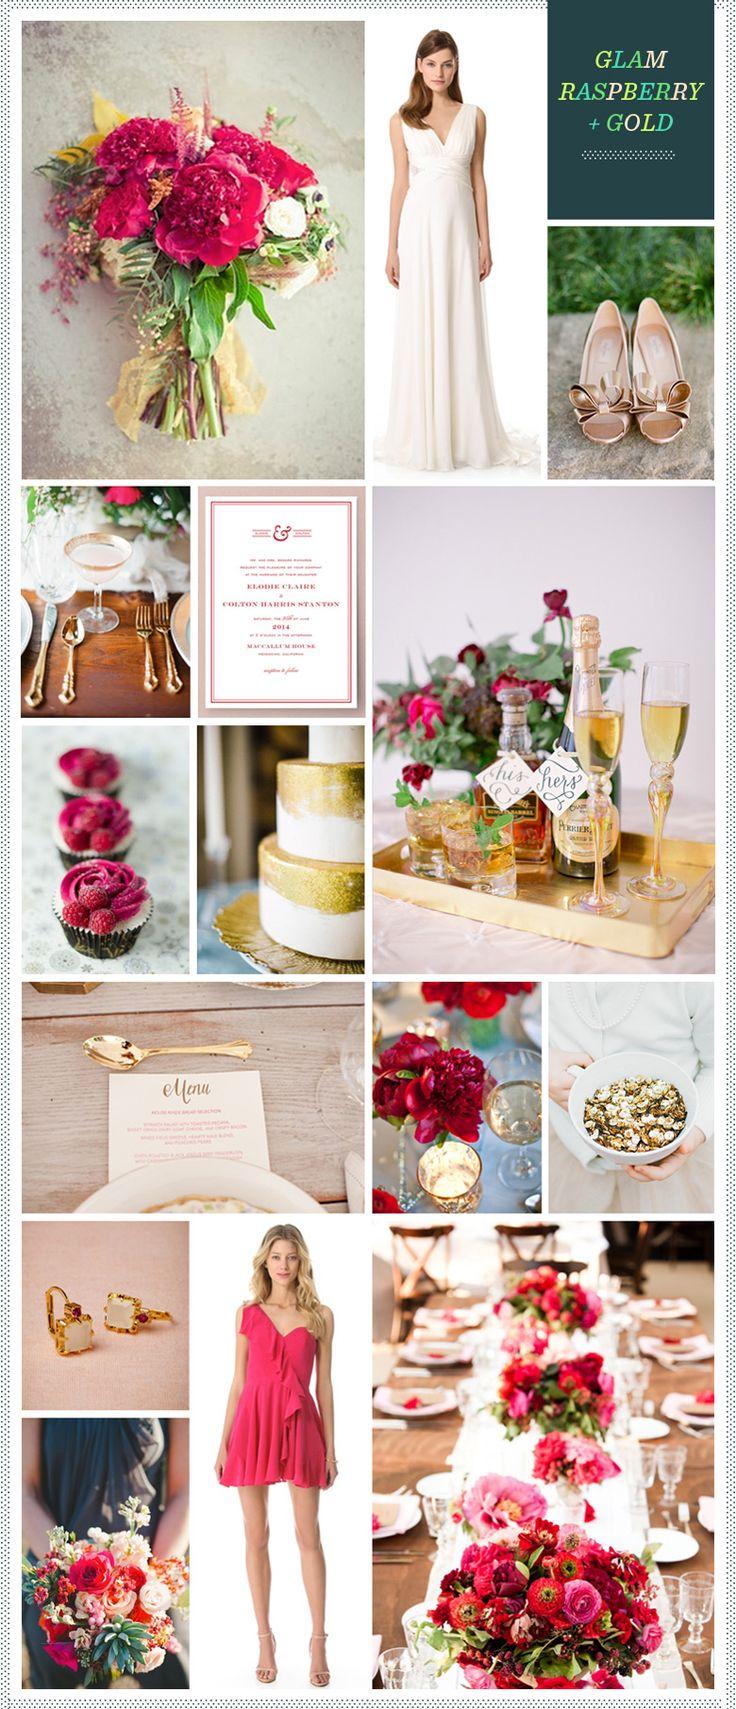 Glam Raspberry + Gold Wedding Inspiration                                                                                                                                                                                 More